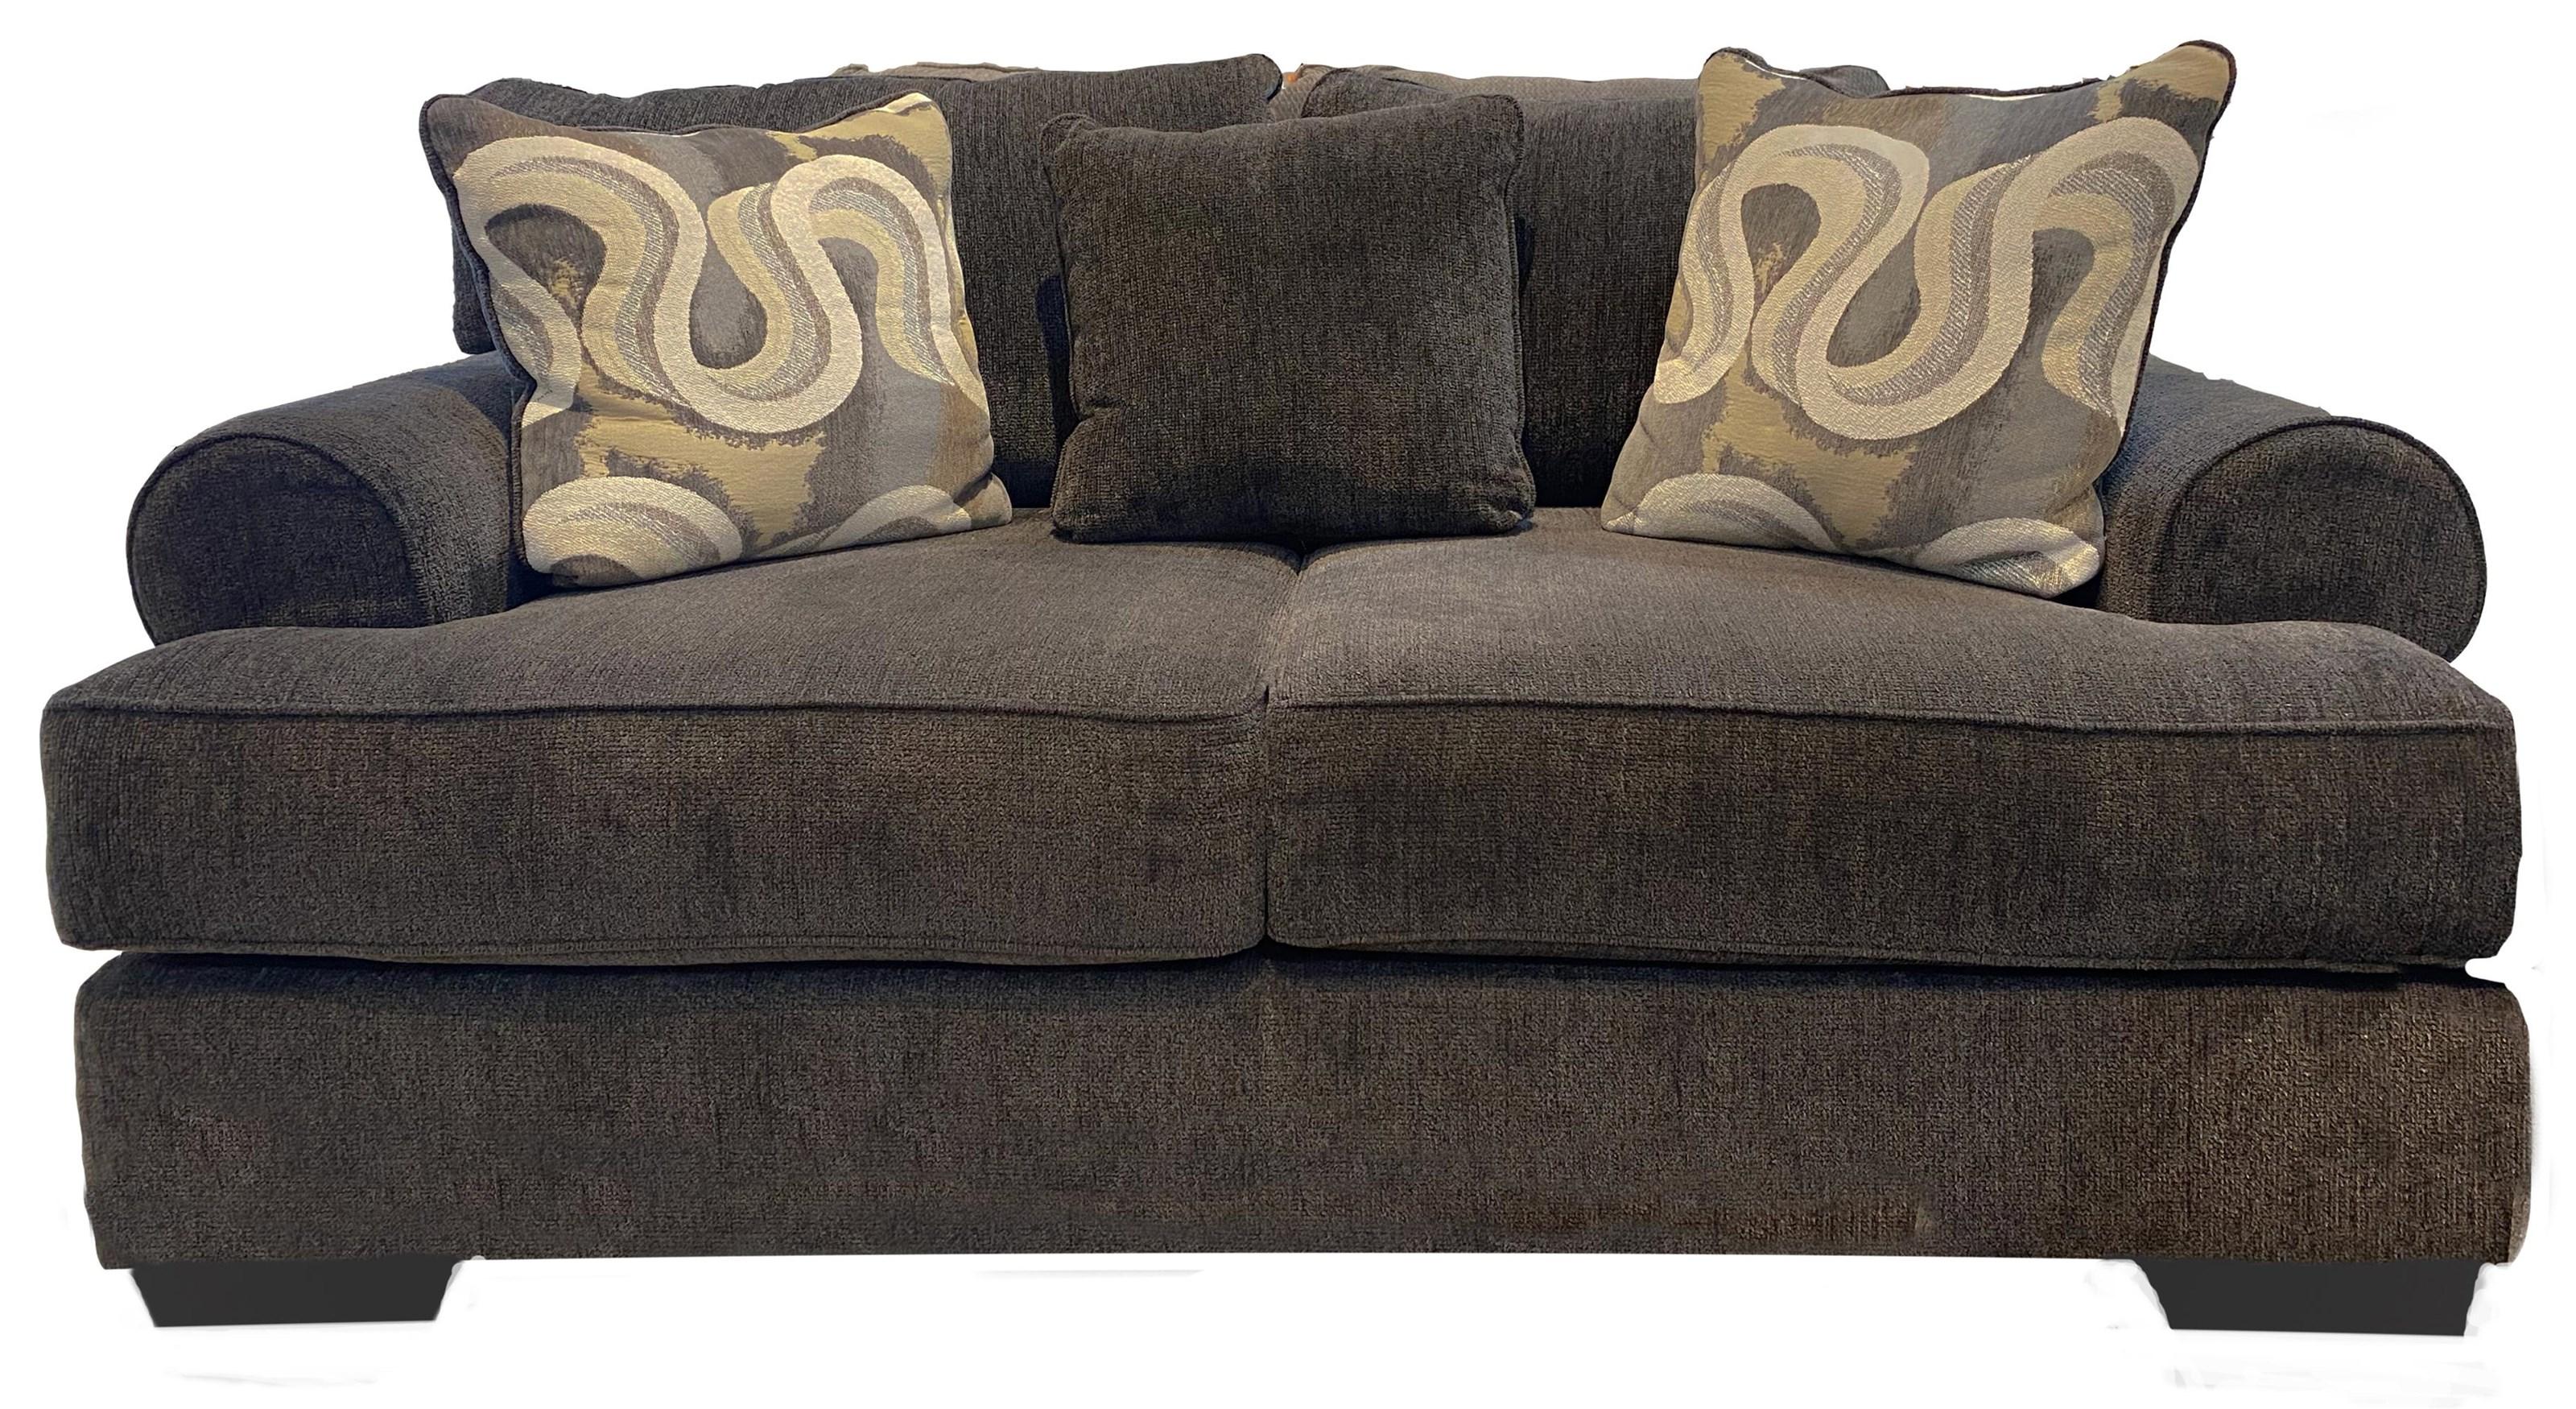 Camaro Champ Granite Loveseat by Michael Nicholas at Beck's Furniture